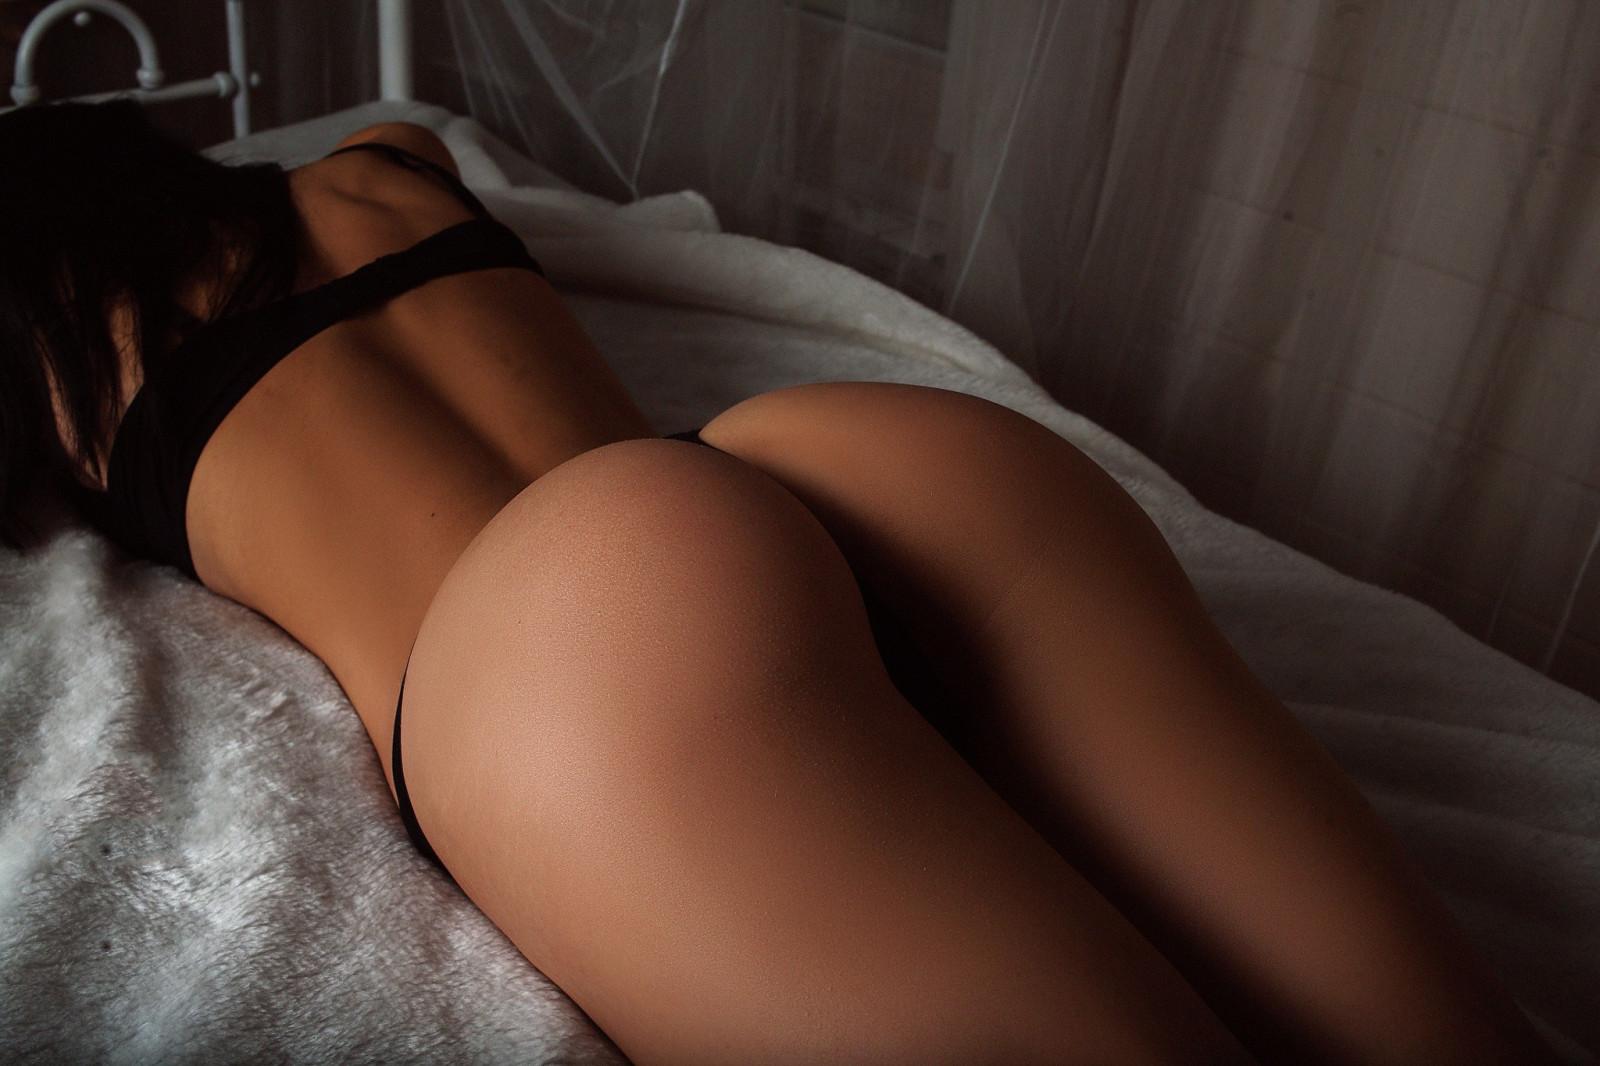 Woman sexy butt, sonali bandre xnx pics